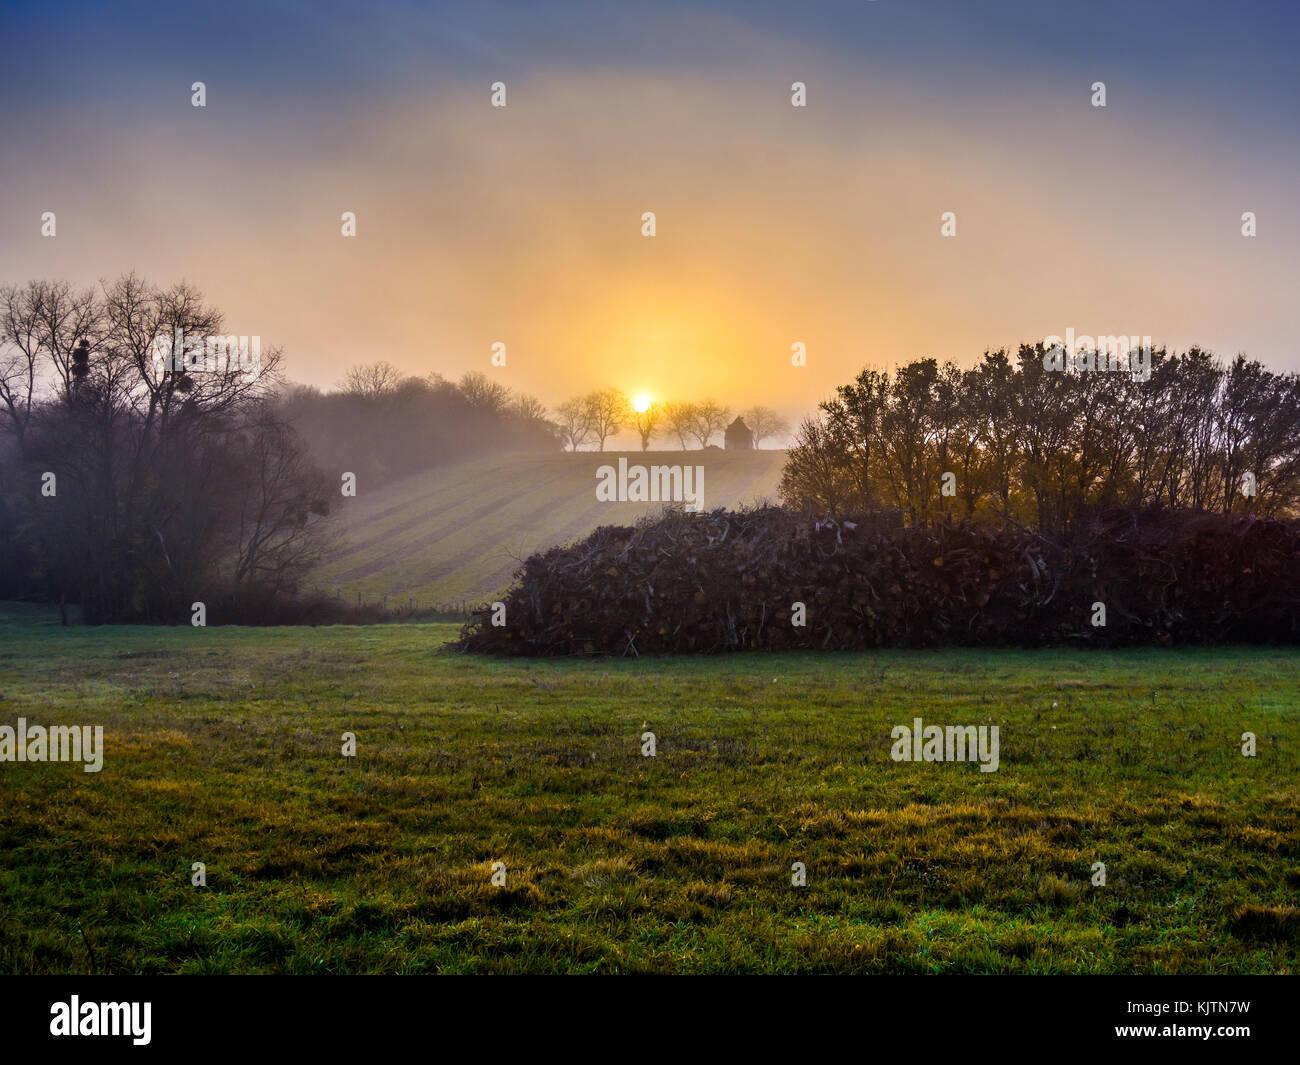 Sunrise through morning mist - France. - Stock Image